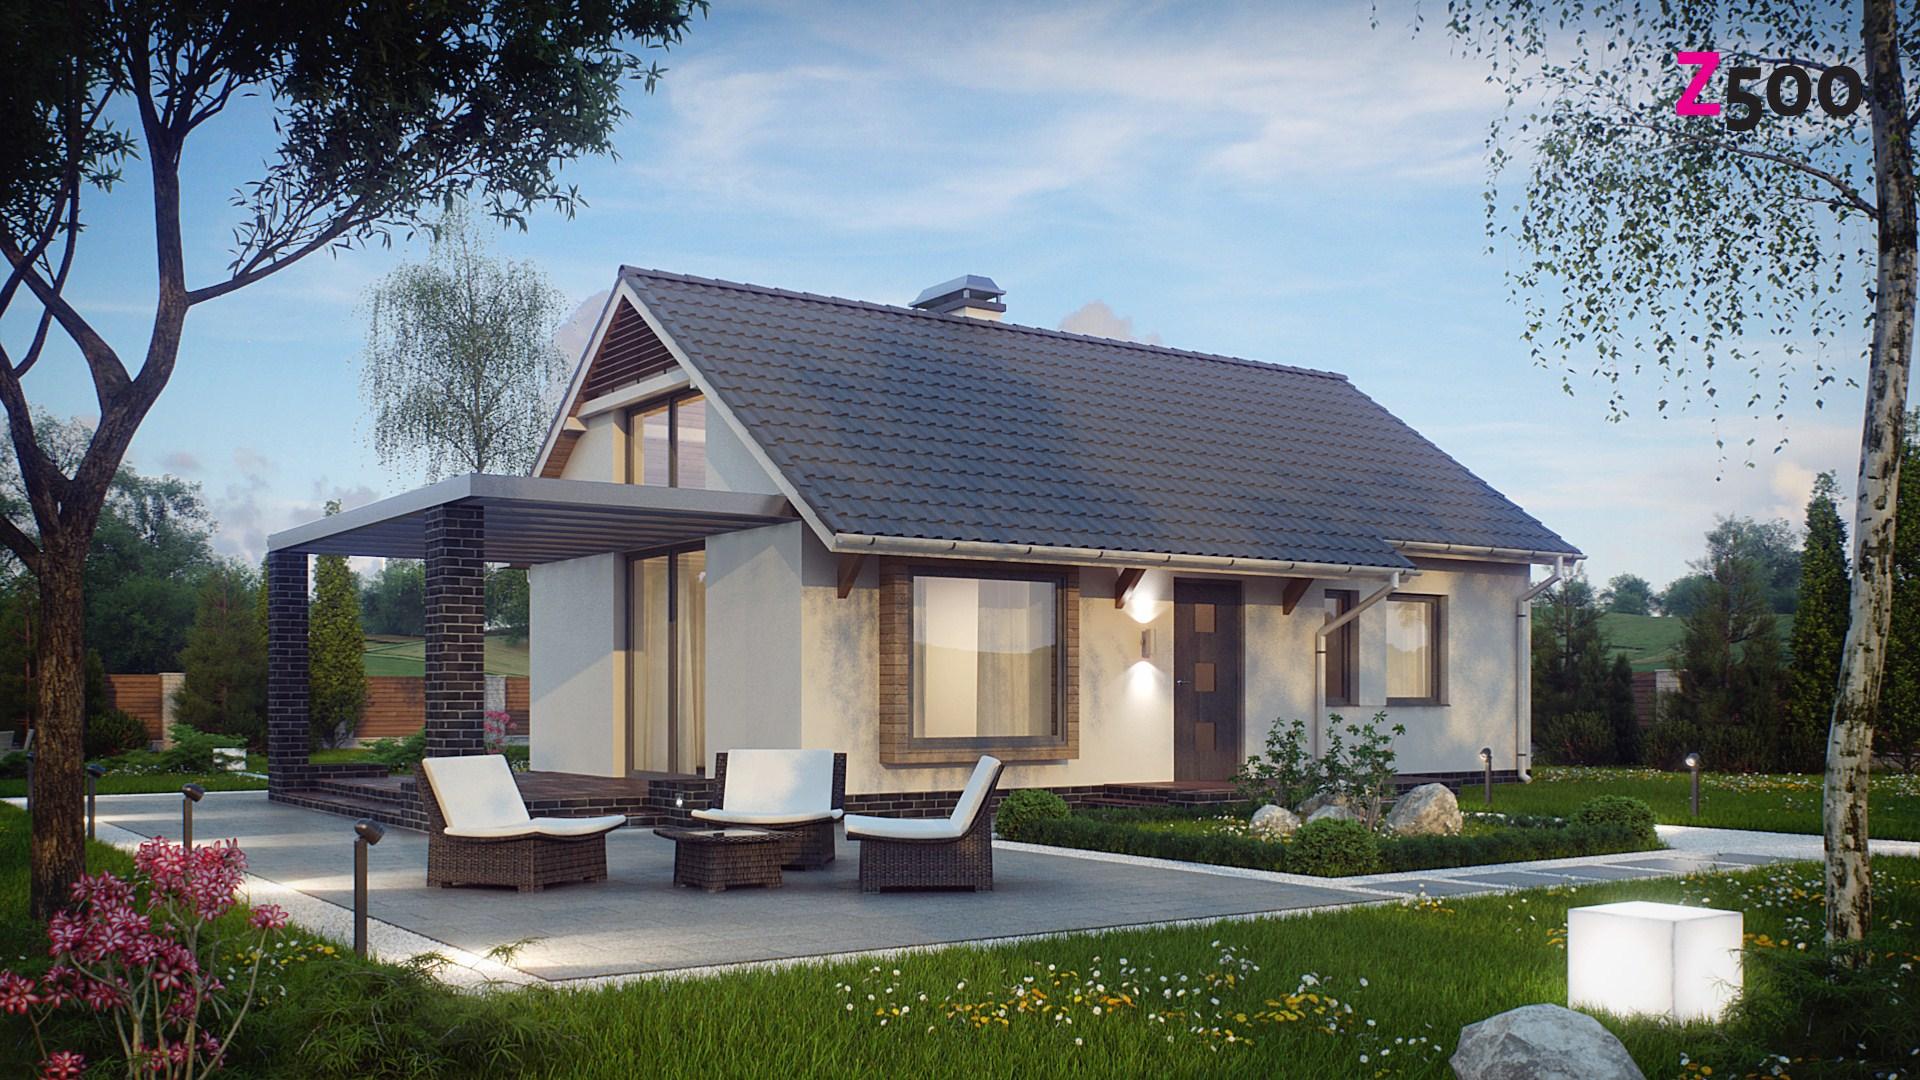 Продам дом из пеноблока image 2